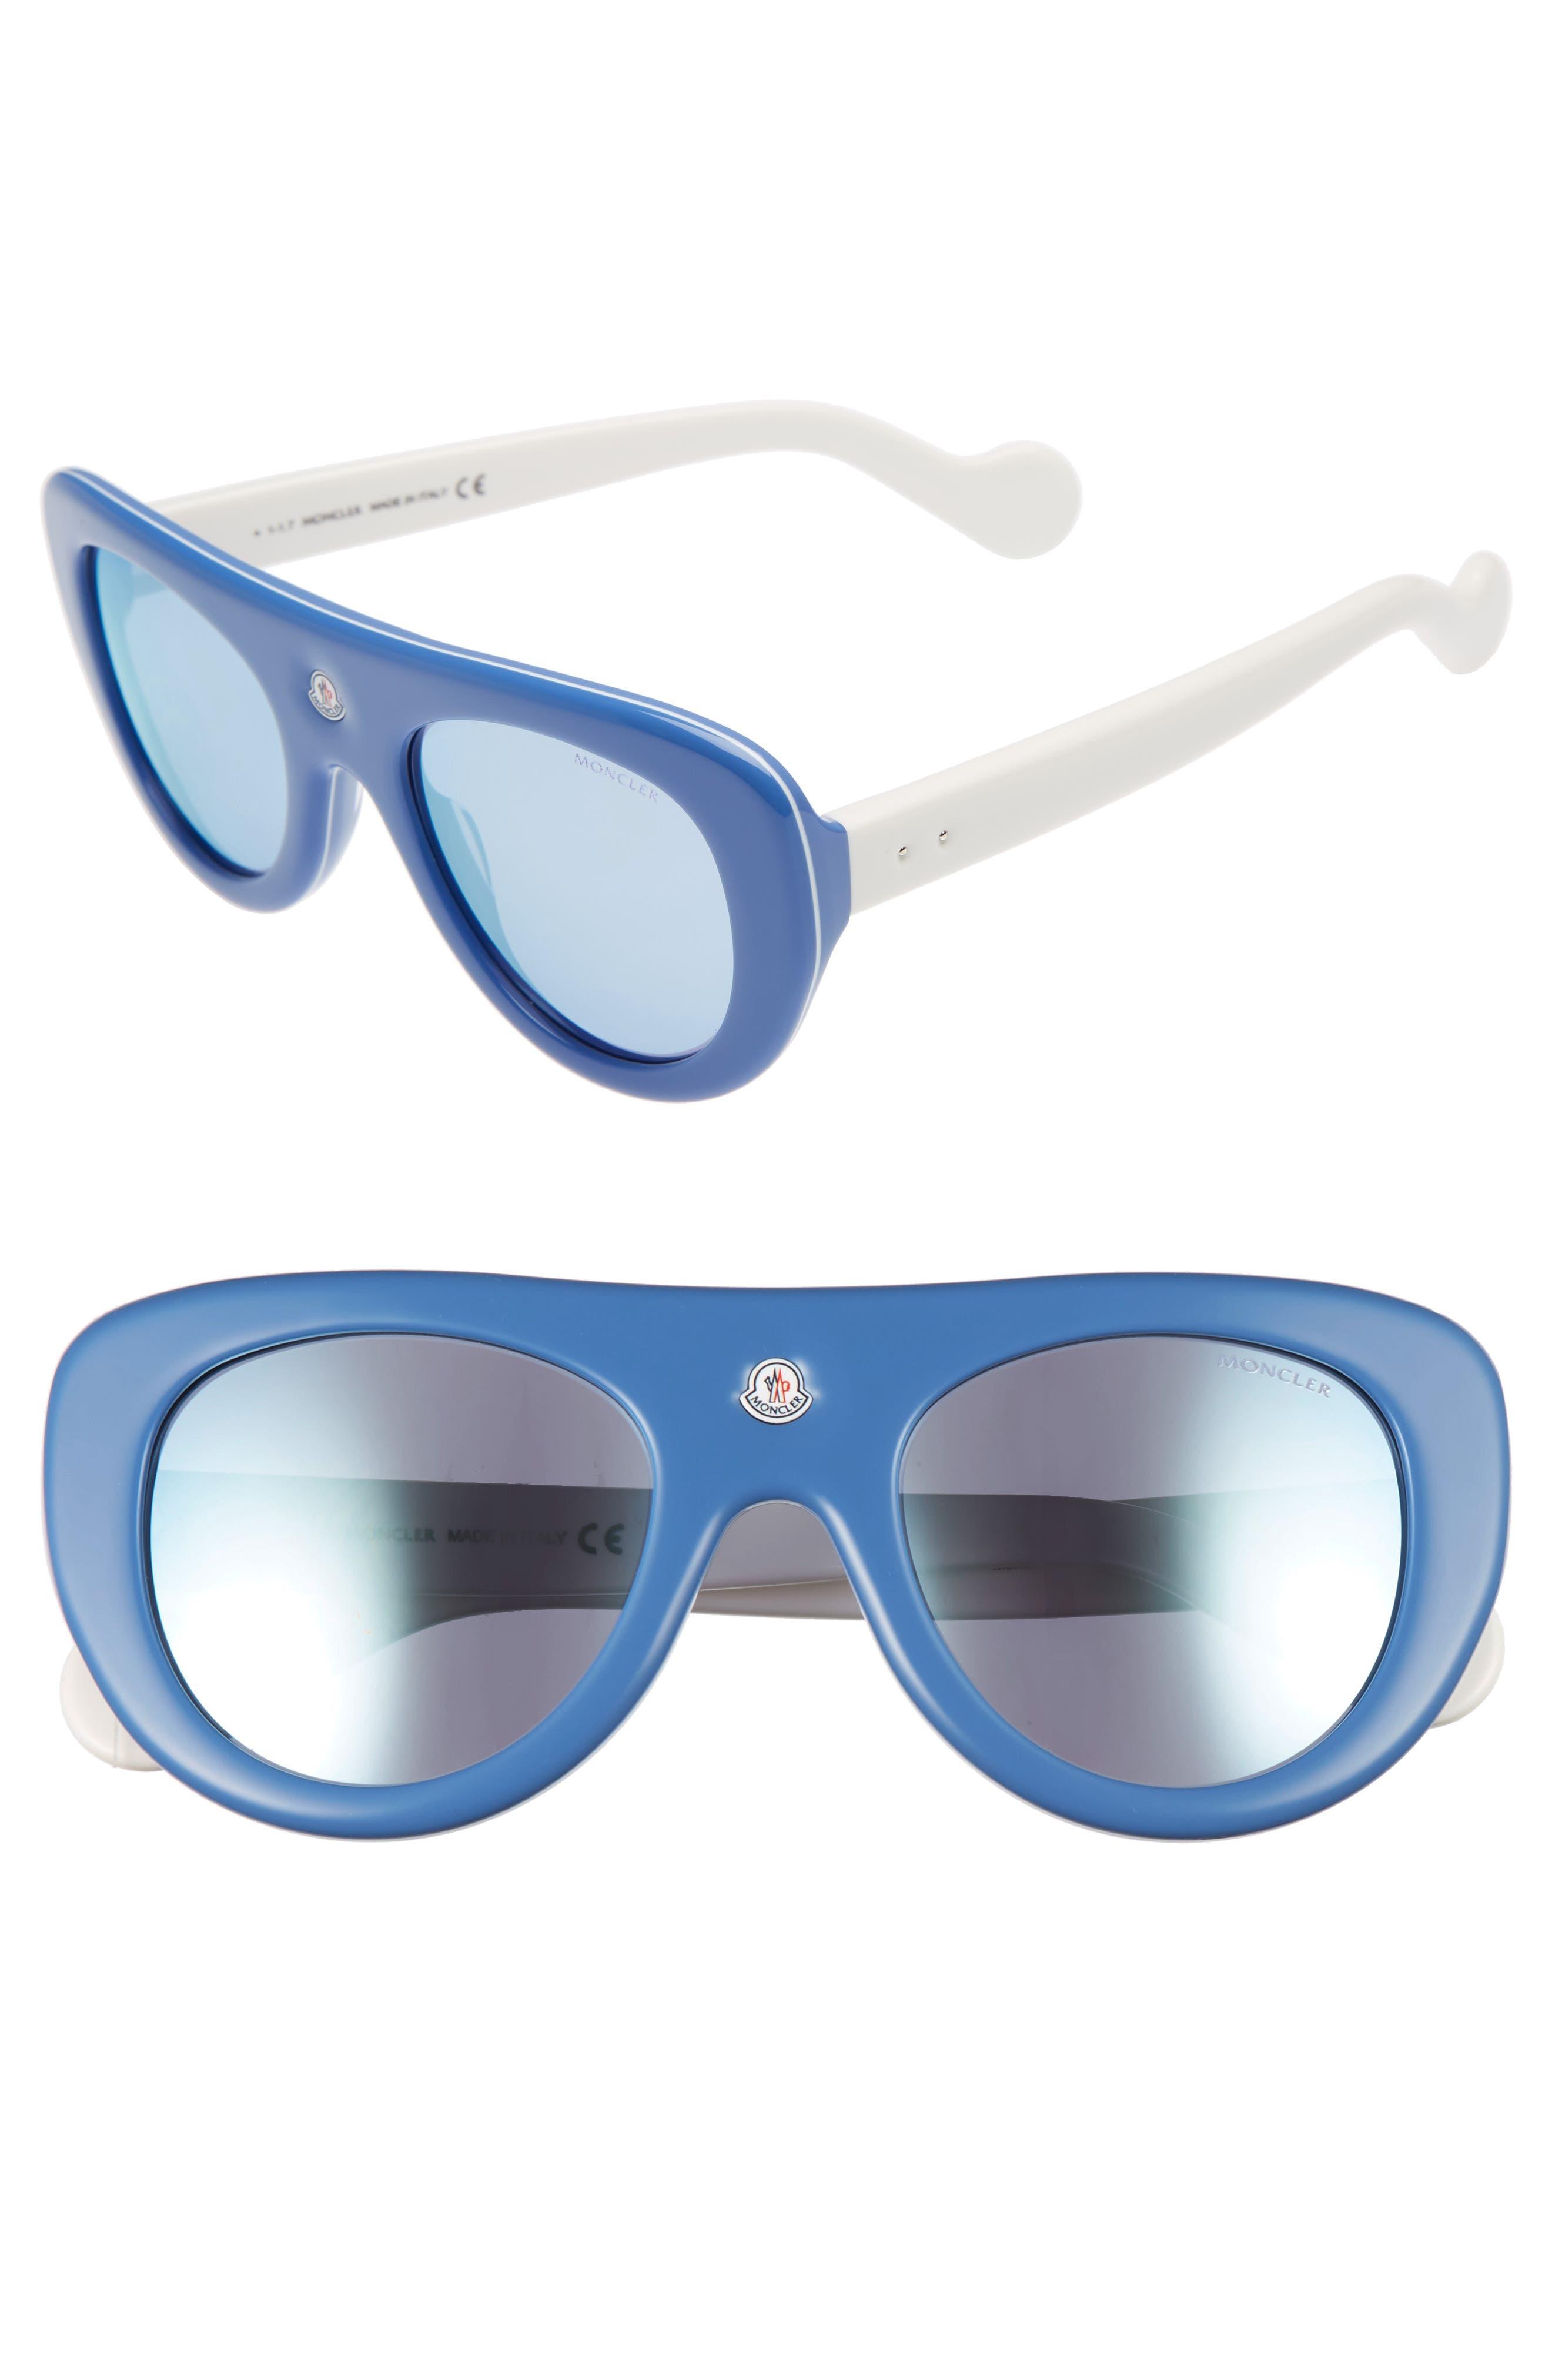 51mm Shield Sunglasses,                             Main thumbnail 1, color,                             BLUE/ IVORY/ VIOLET MIRROR